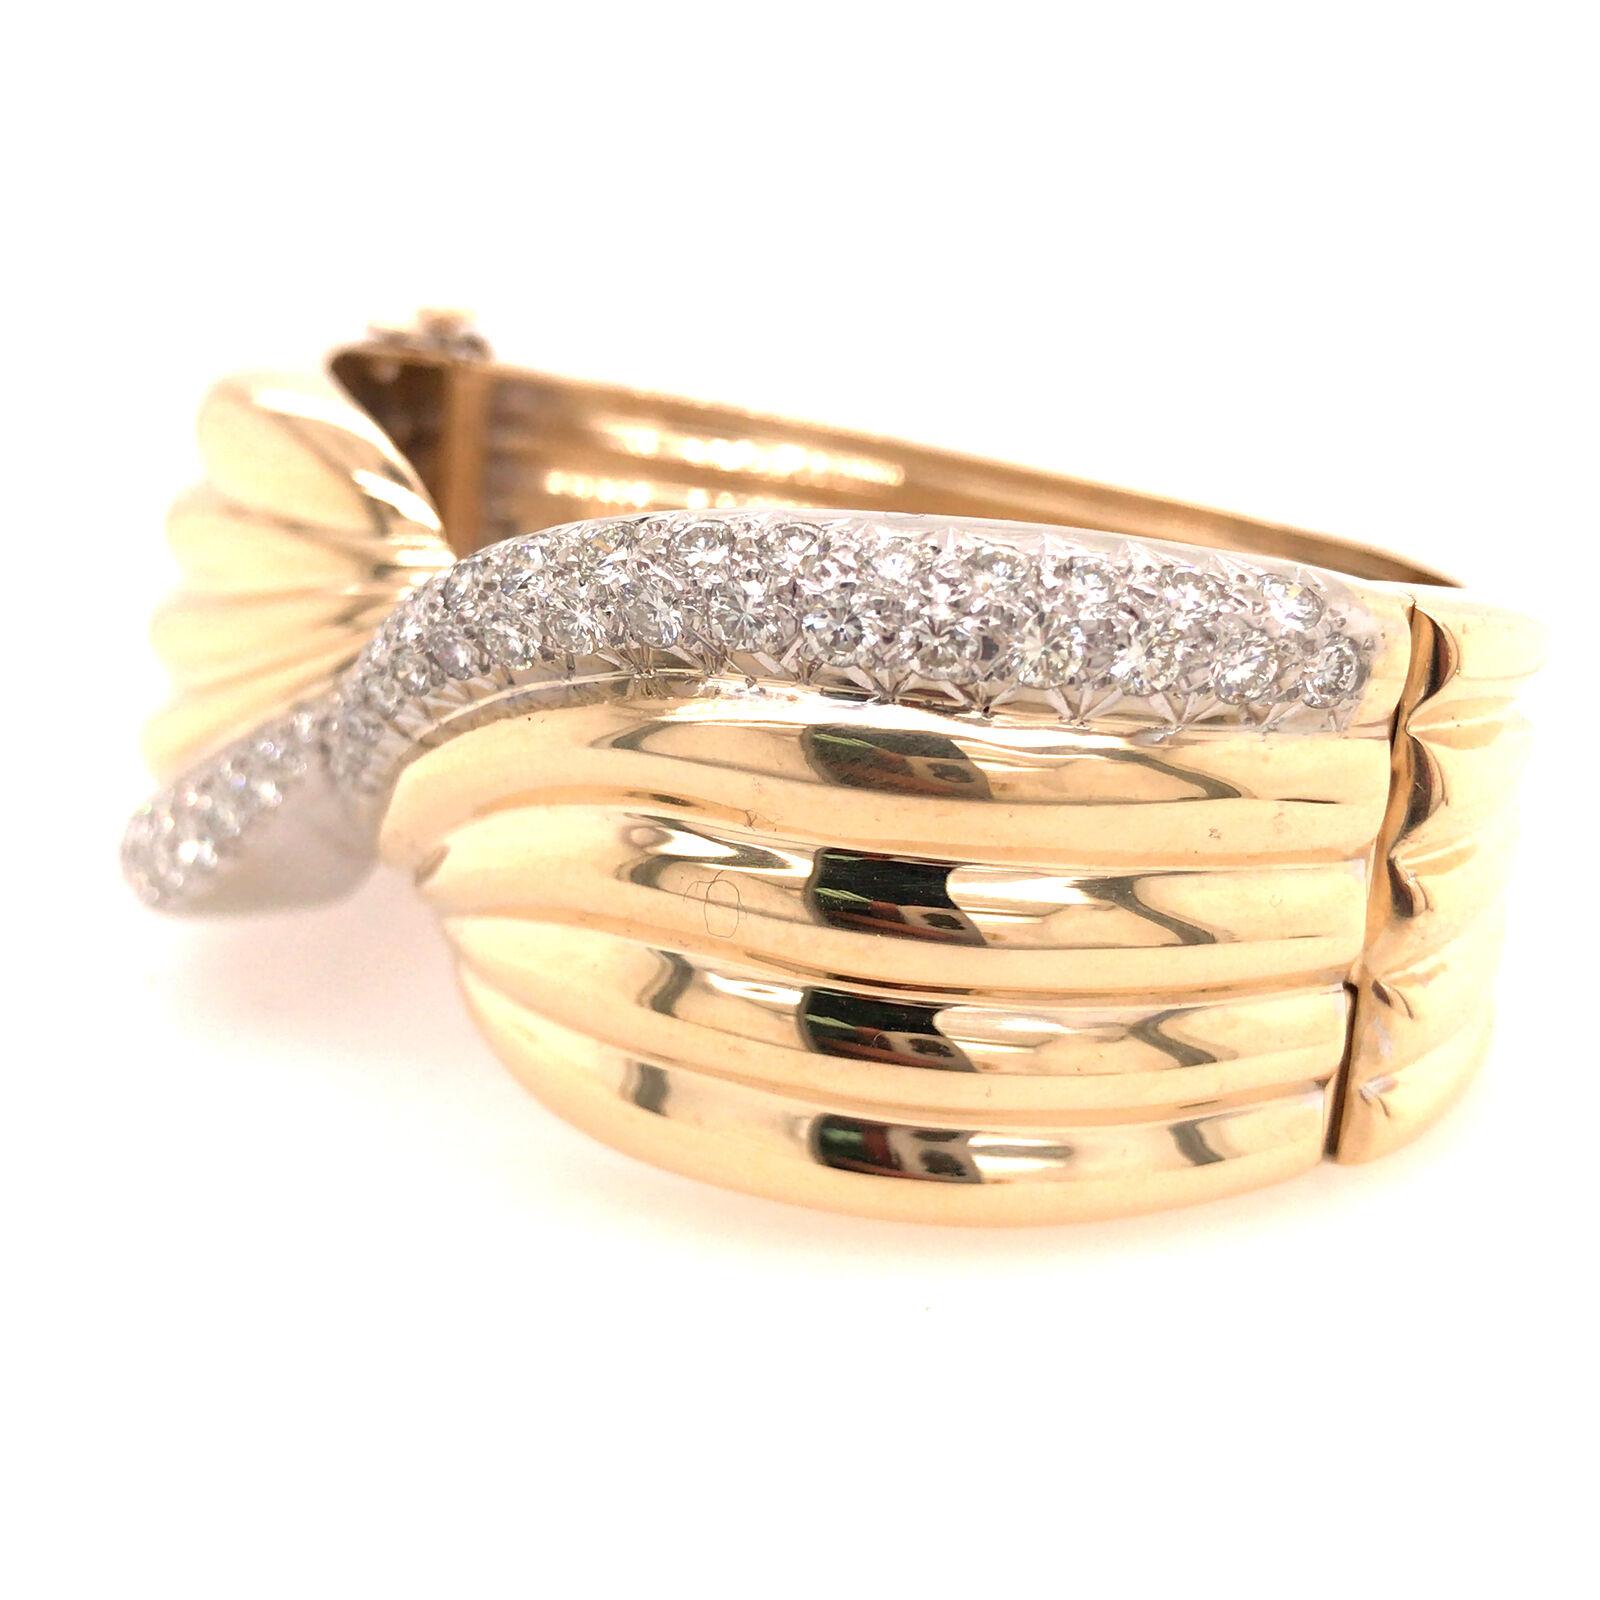 14K Wide Diamond Twist Cuff Two-Tone Gold - image 2